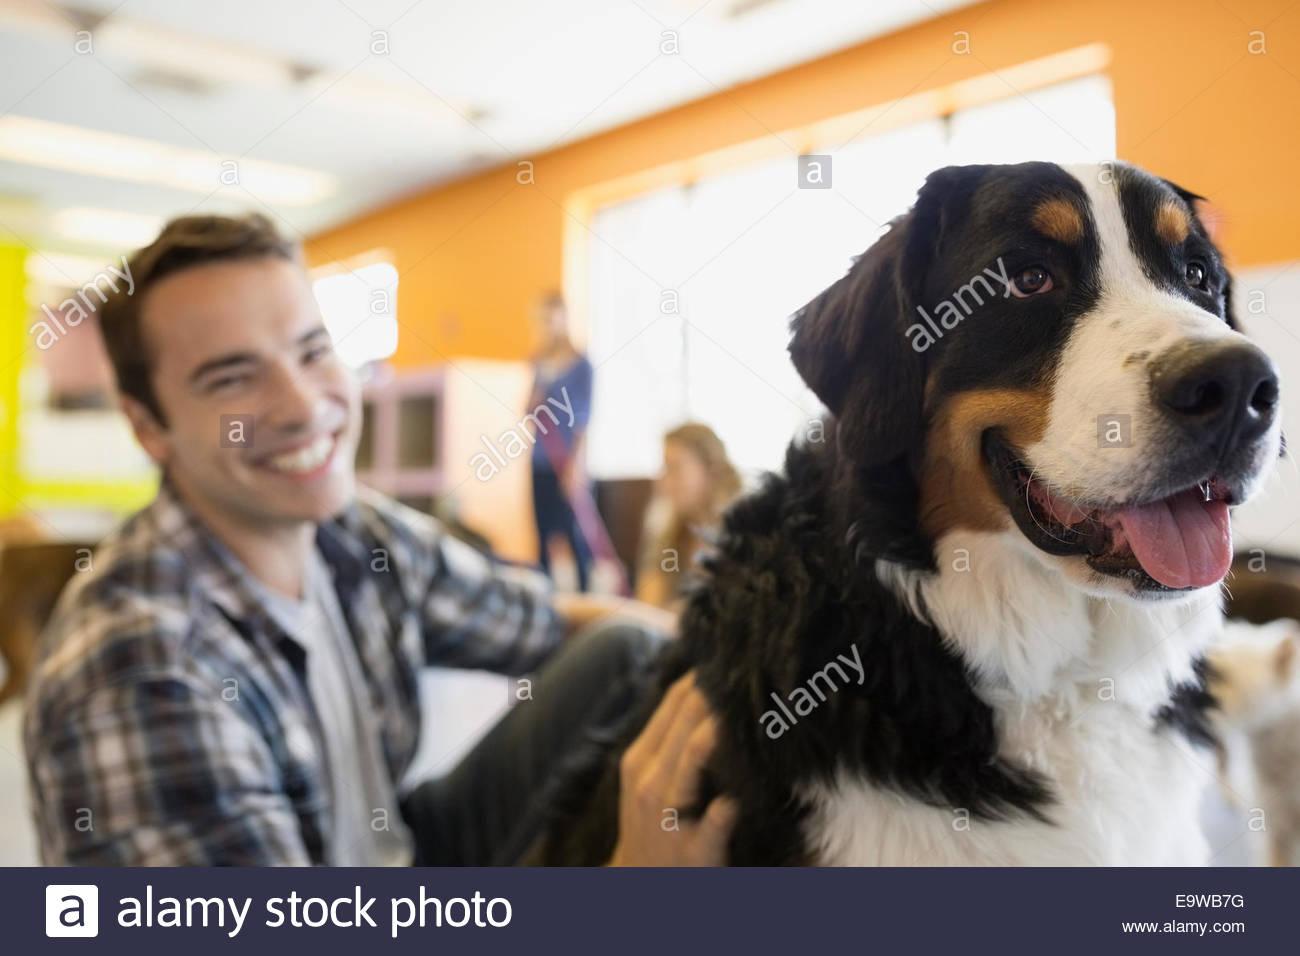 Portrait of smiling man with Saint Bernard dog - Stock Image